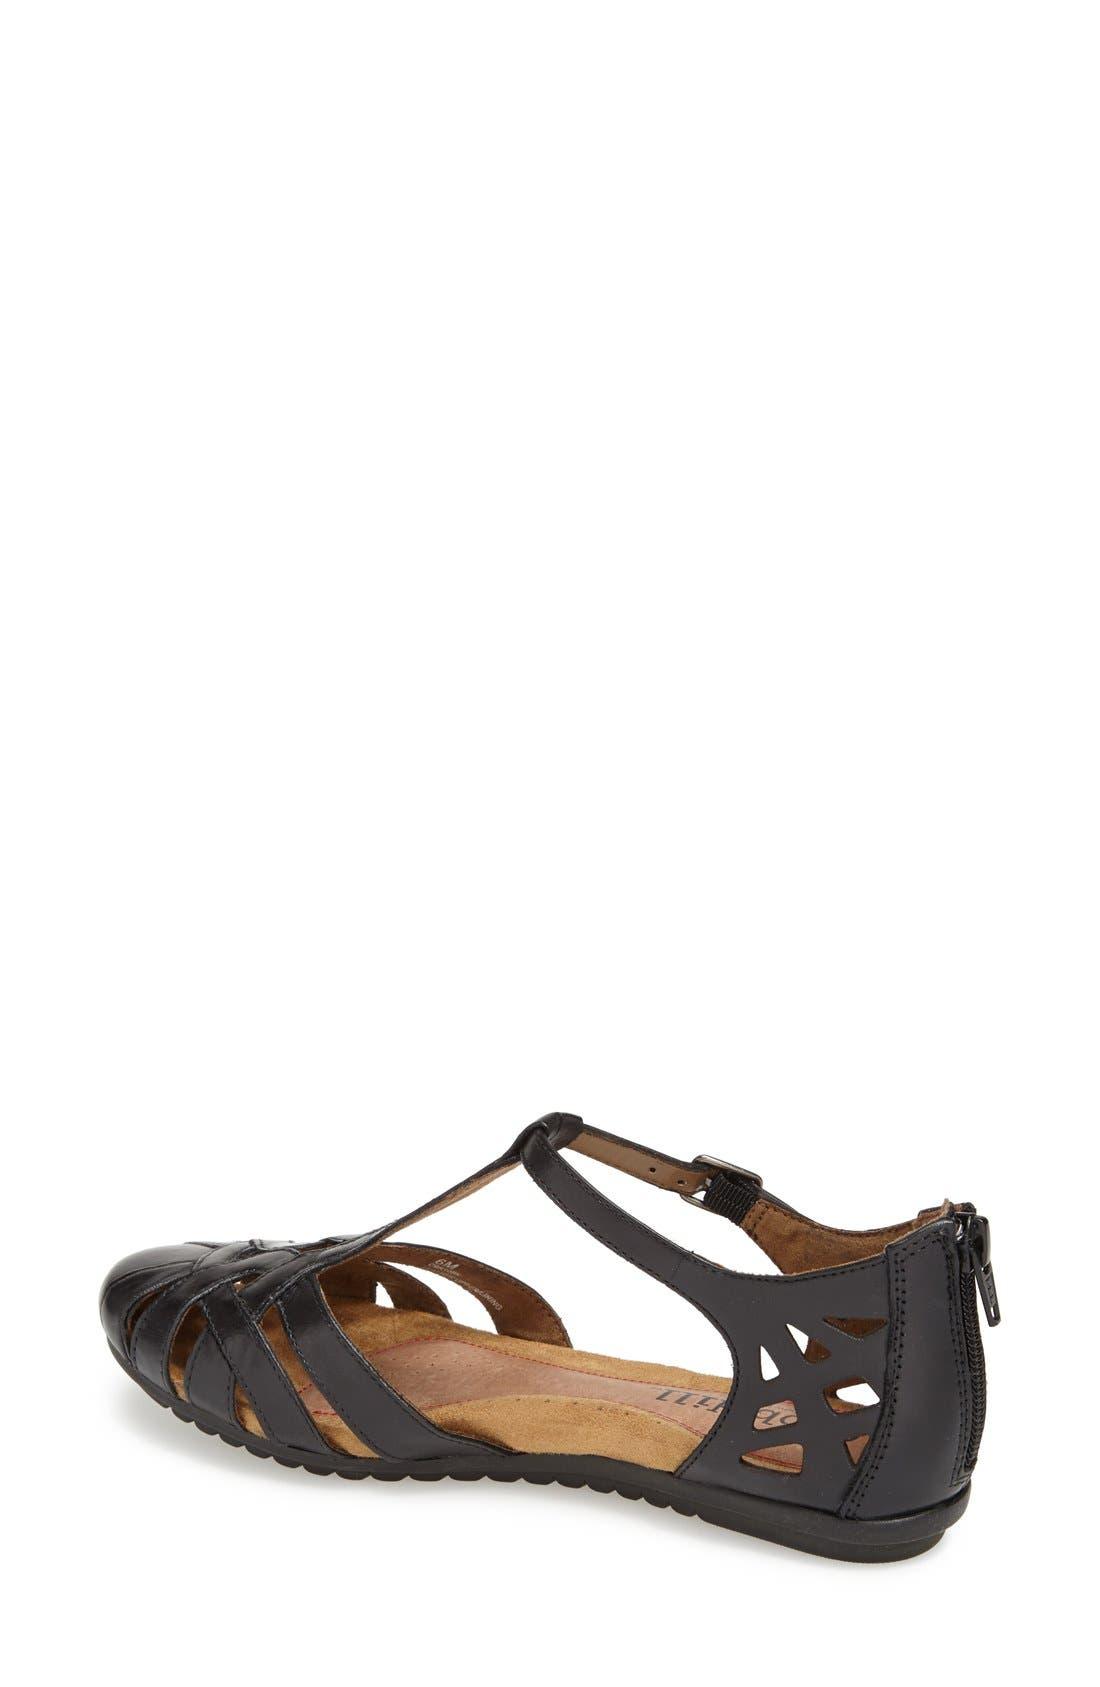 Alternate Image 2  - Rockport Cobb Hill 'Ireland' Leather Sandal (Women)